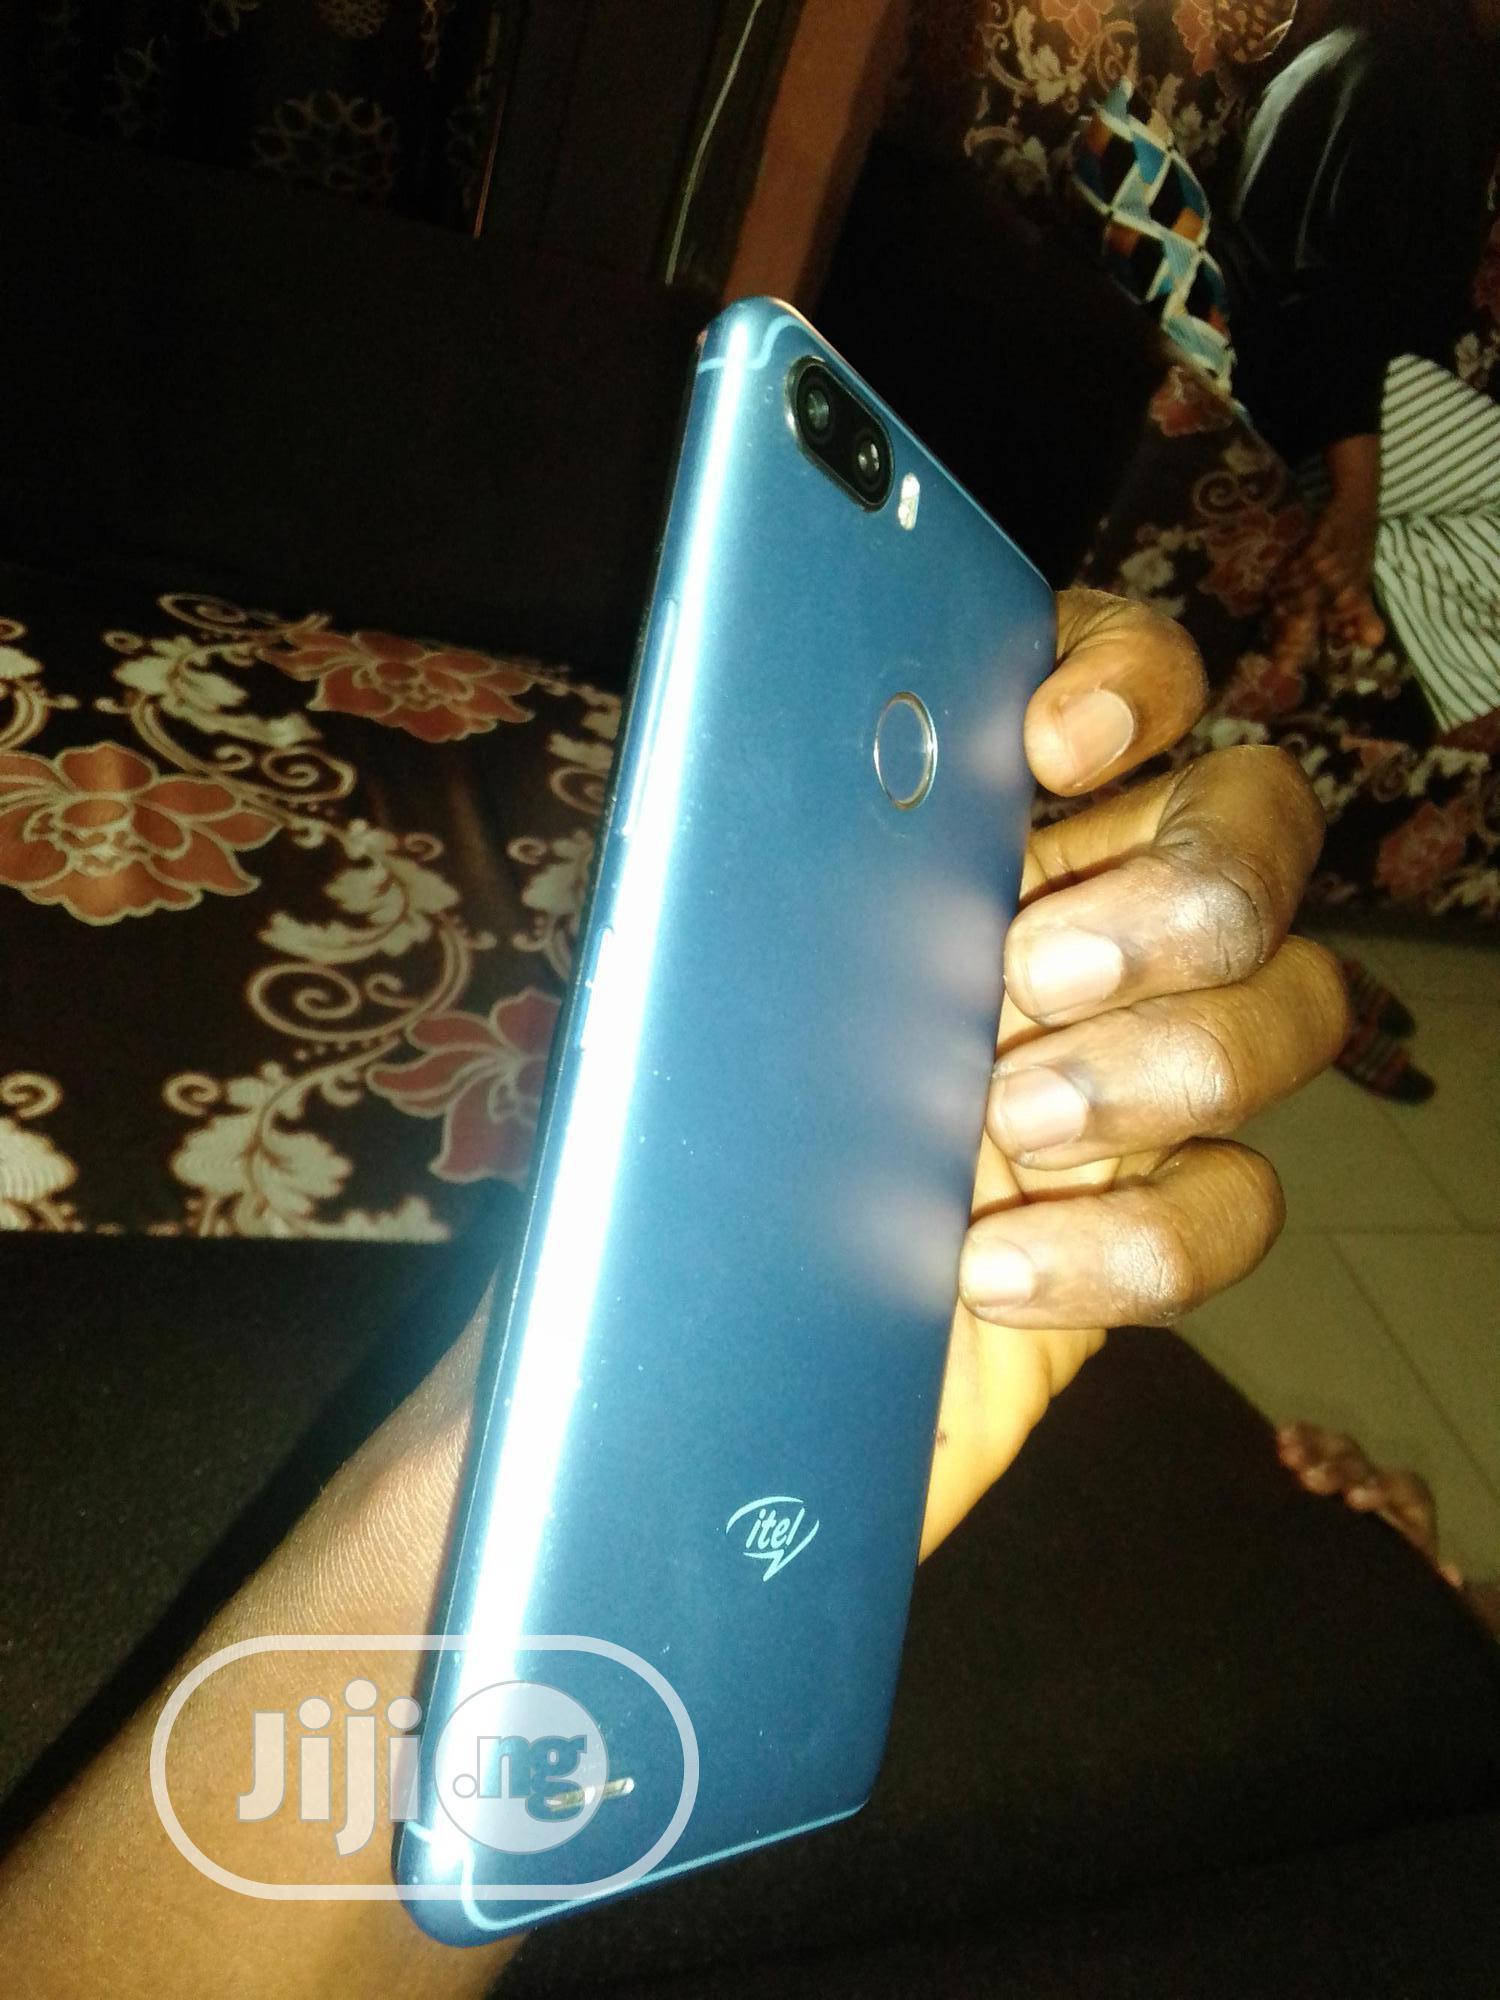 Archive: Itel P32 8 GB Blue